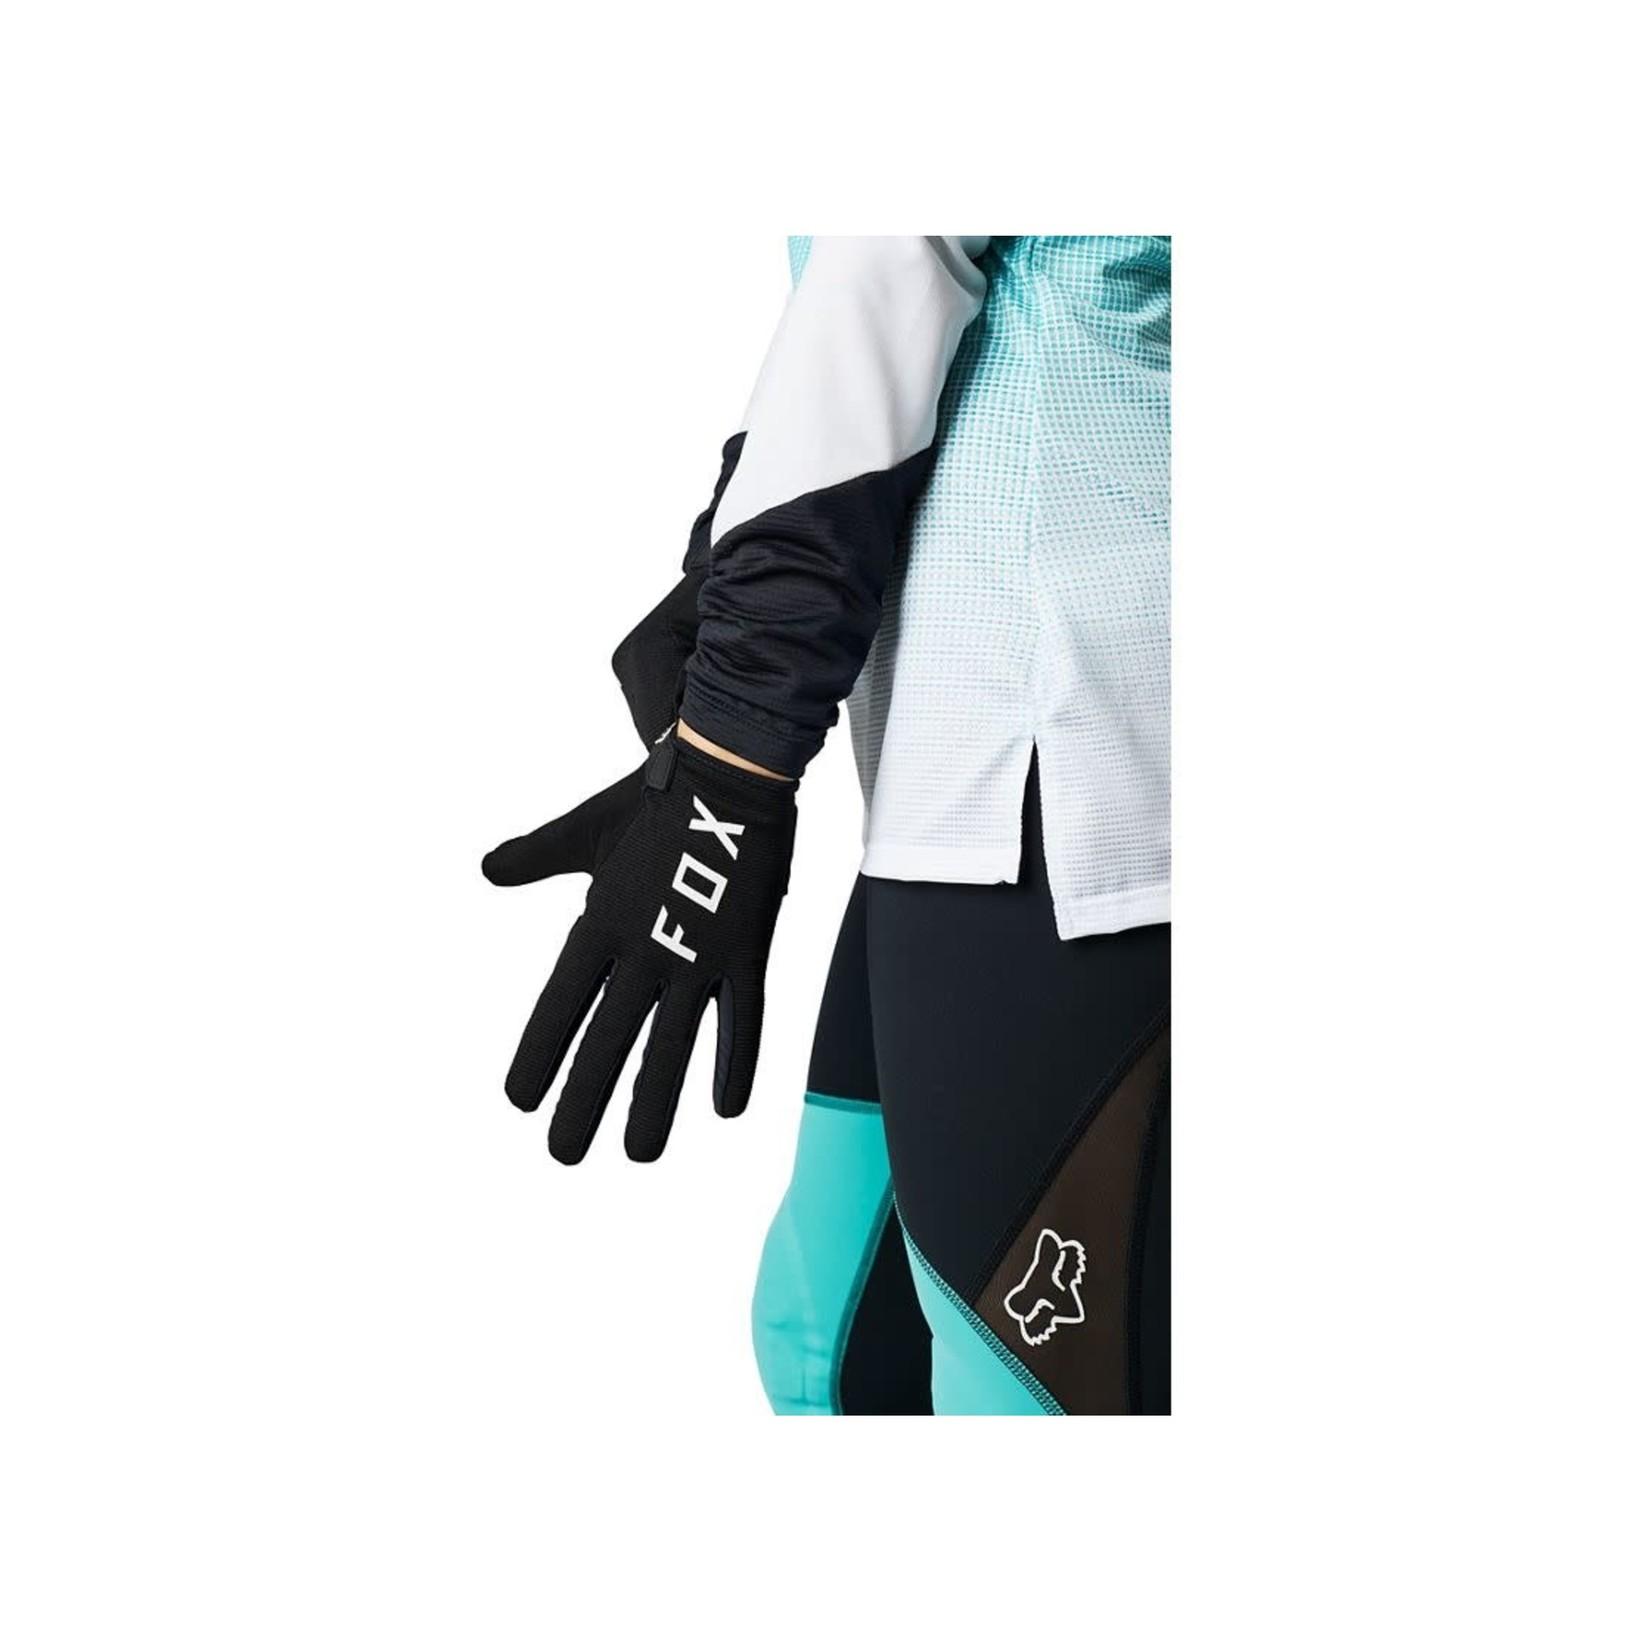 Fox Fox Glove Ranger Gel